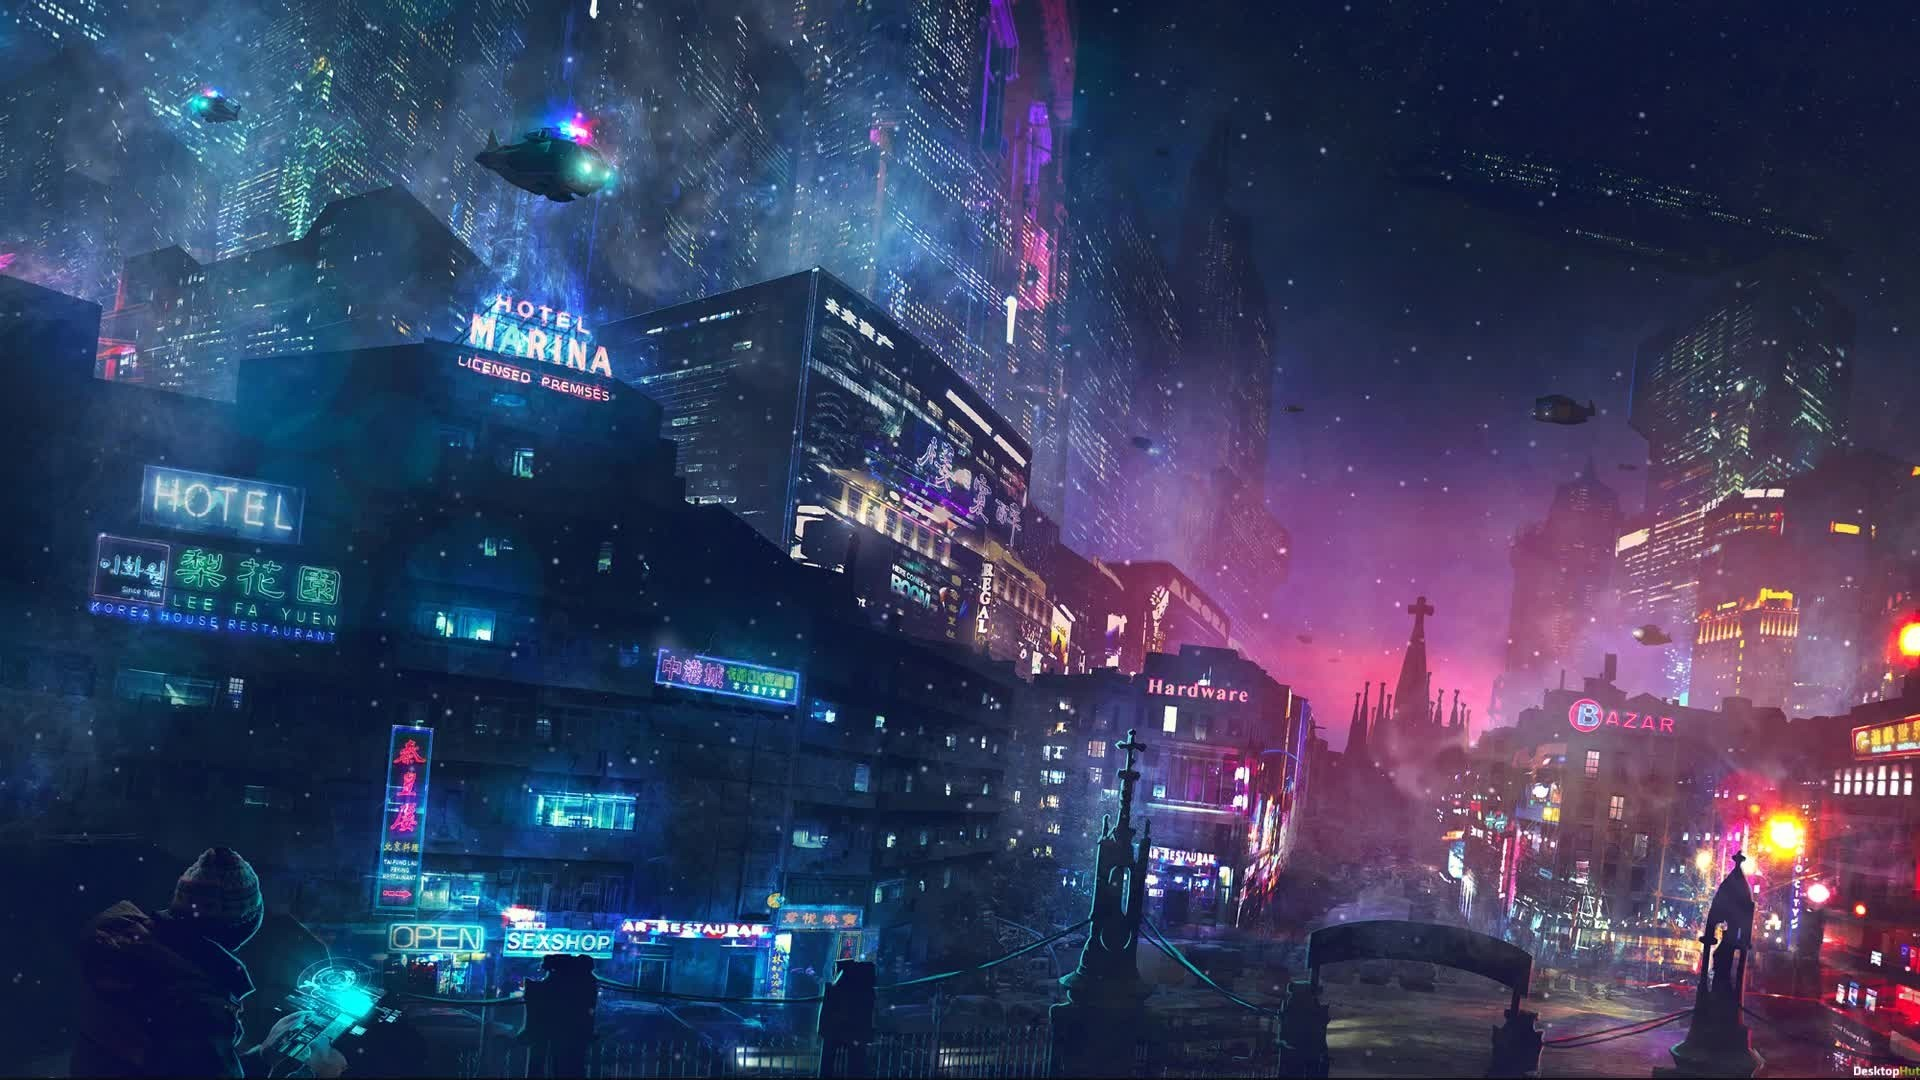 Cyberpunk City Art Image